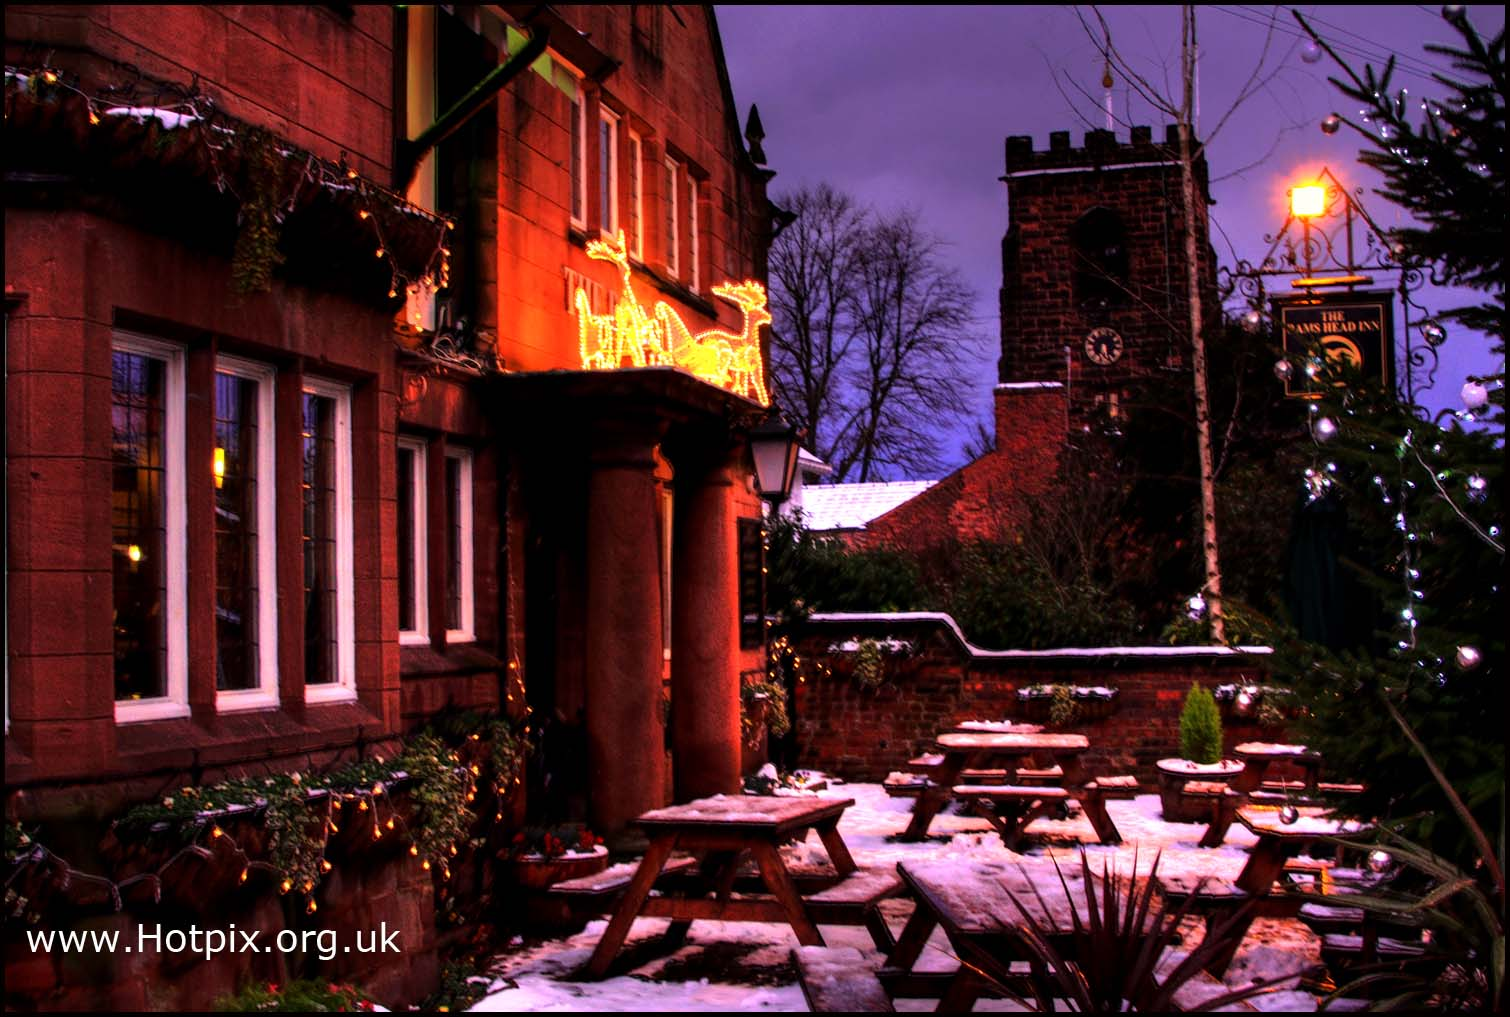 Grappenhall,village,rams,head,ramshead,pub,public,house,cobble,cobbled,dusk,snow,winter,warrington,england,cheshire,great,britain,GB,decoration,tony,smith,tonysmith,hotpix,hotpixuk,tdk,tdktony,purple,sky,purple sky,\u96ea,sneeuw,neige,Schnee,\u0441\u043d\u0435\u0436\u043e\u043a,nieve,HDR,high dynamic range,hotpics,hotpic,hotpick,hotpicks,hot,pics,pix,picks,hotpix.freeserve.co.uk,building,buildings,built,architecture,favourite,pubs,houses,noche,nuit